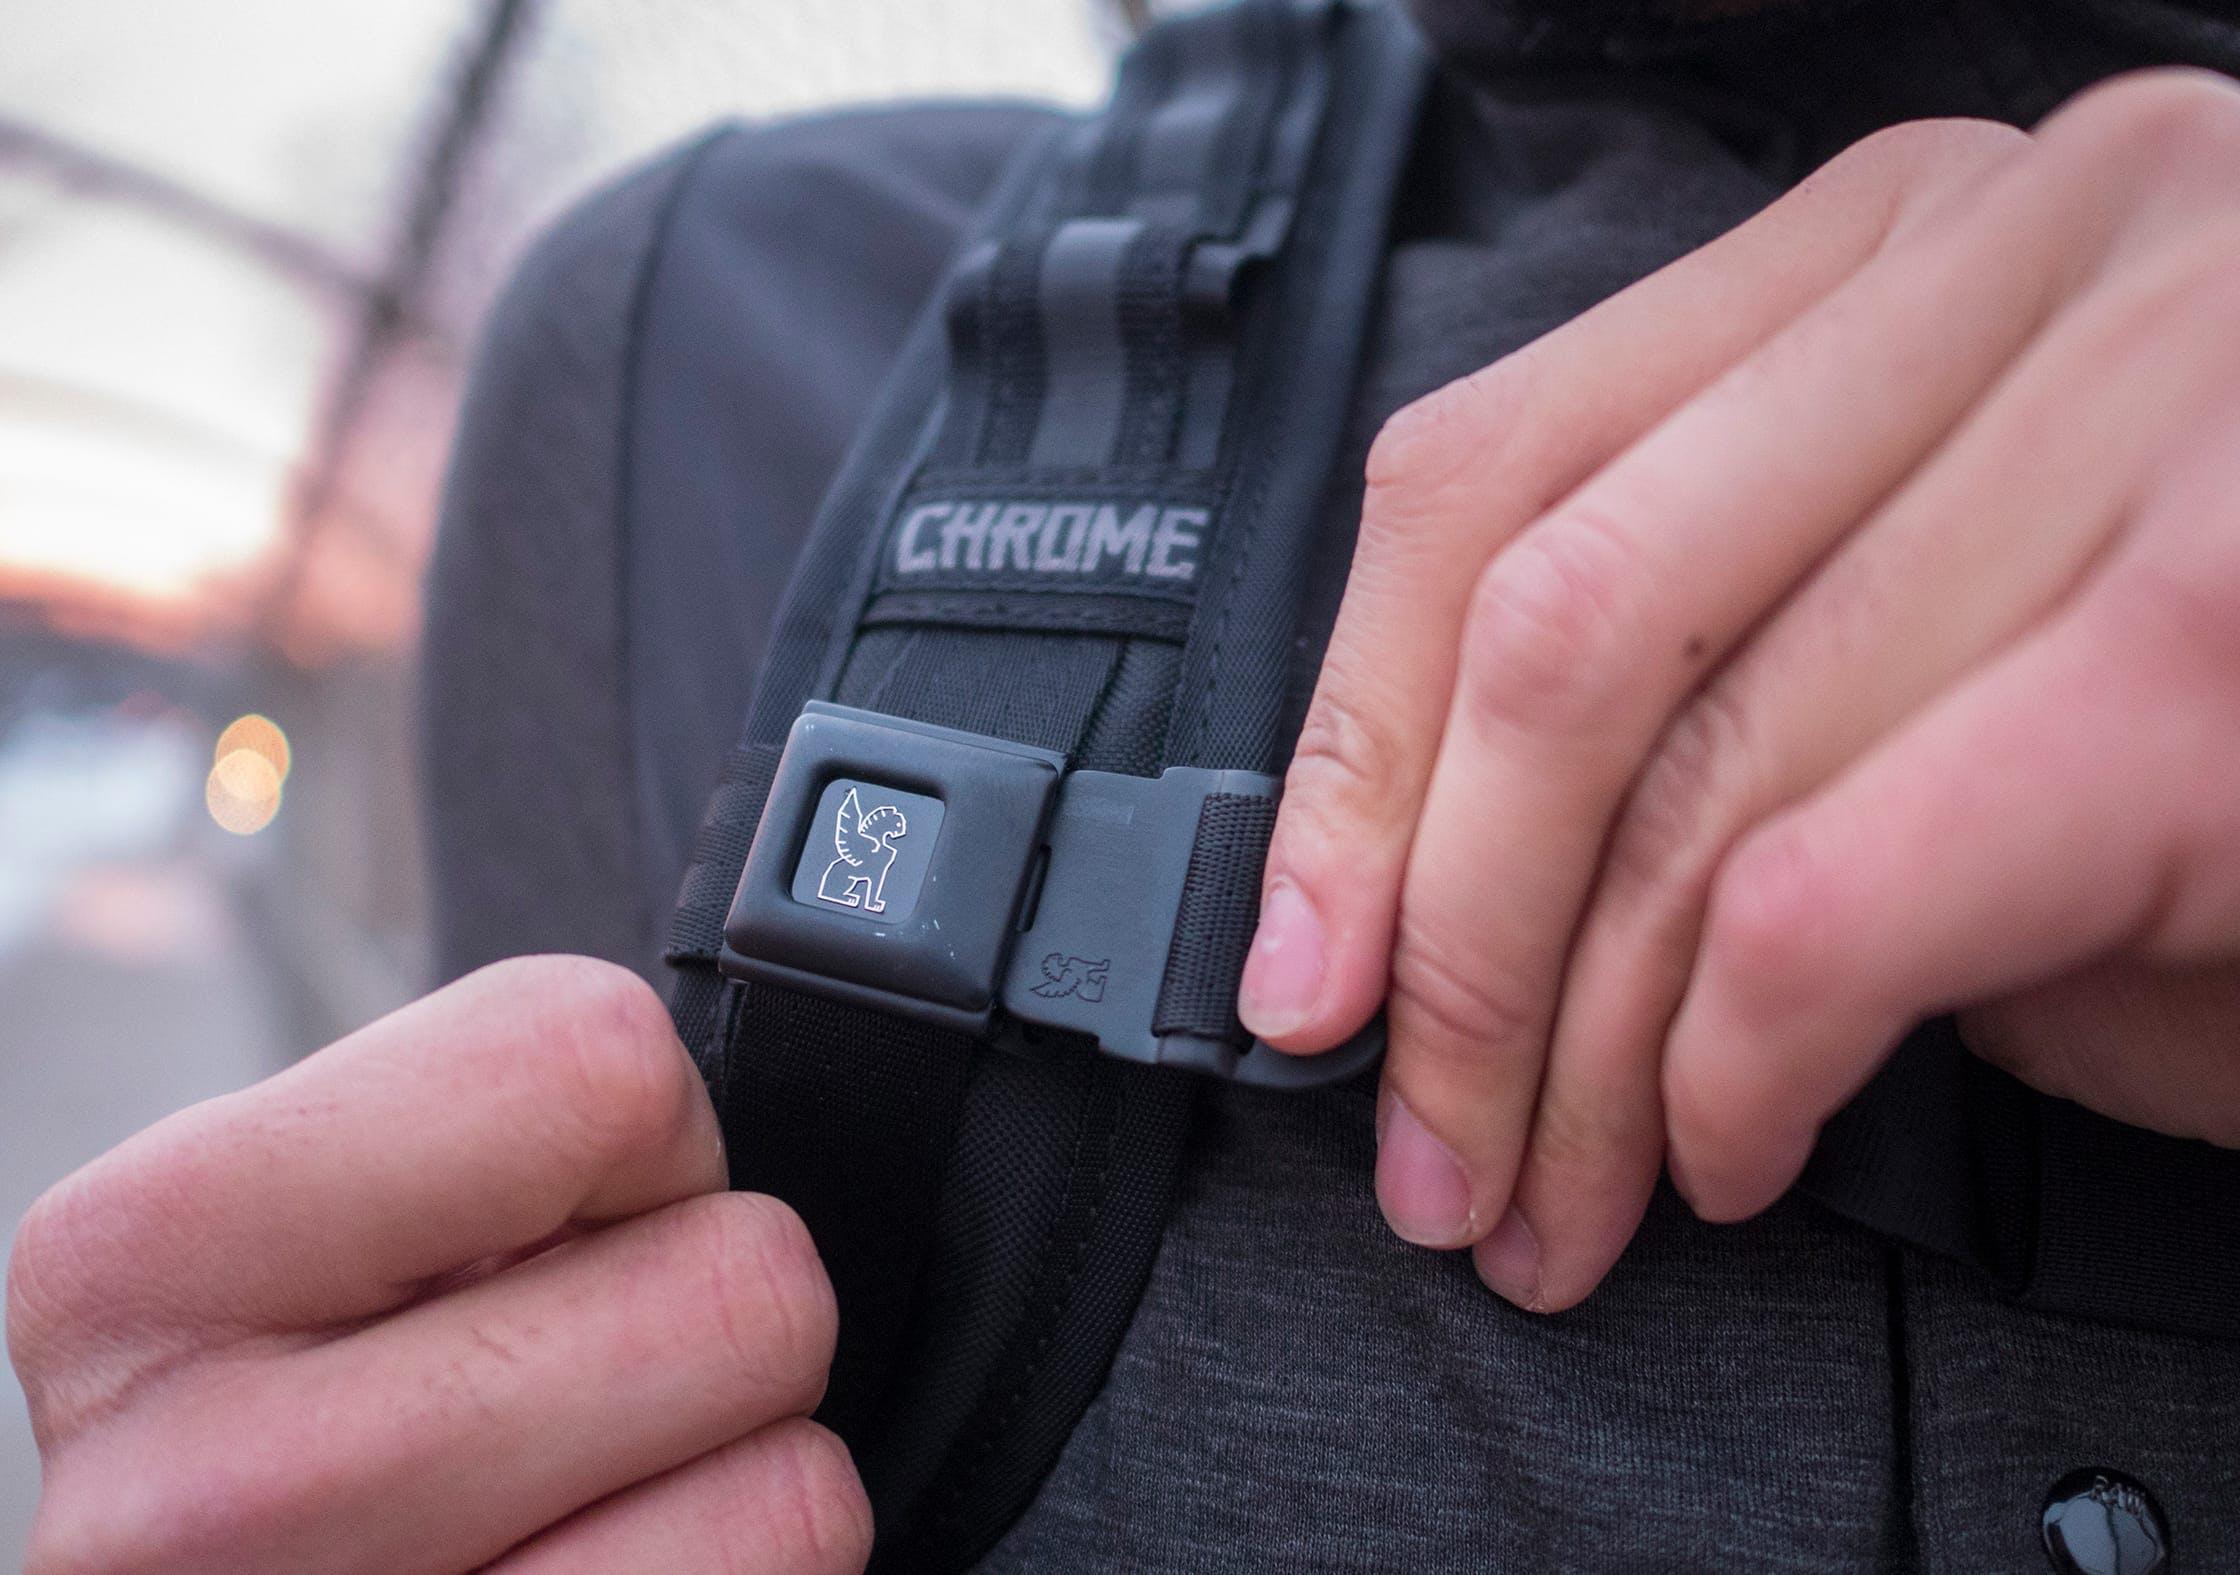 Chrome Niko Sternum Strap